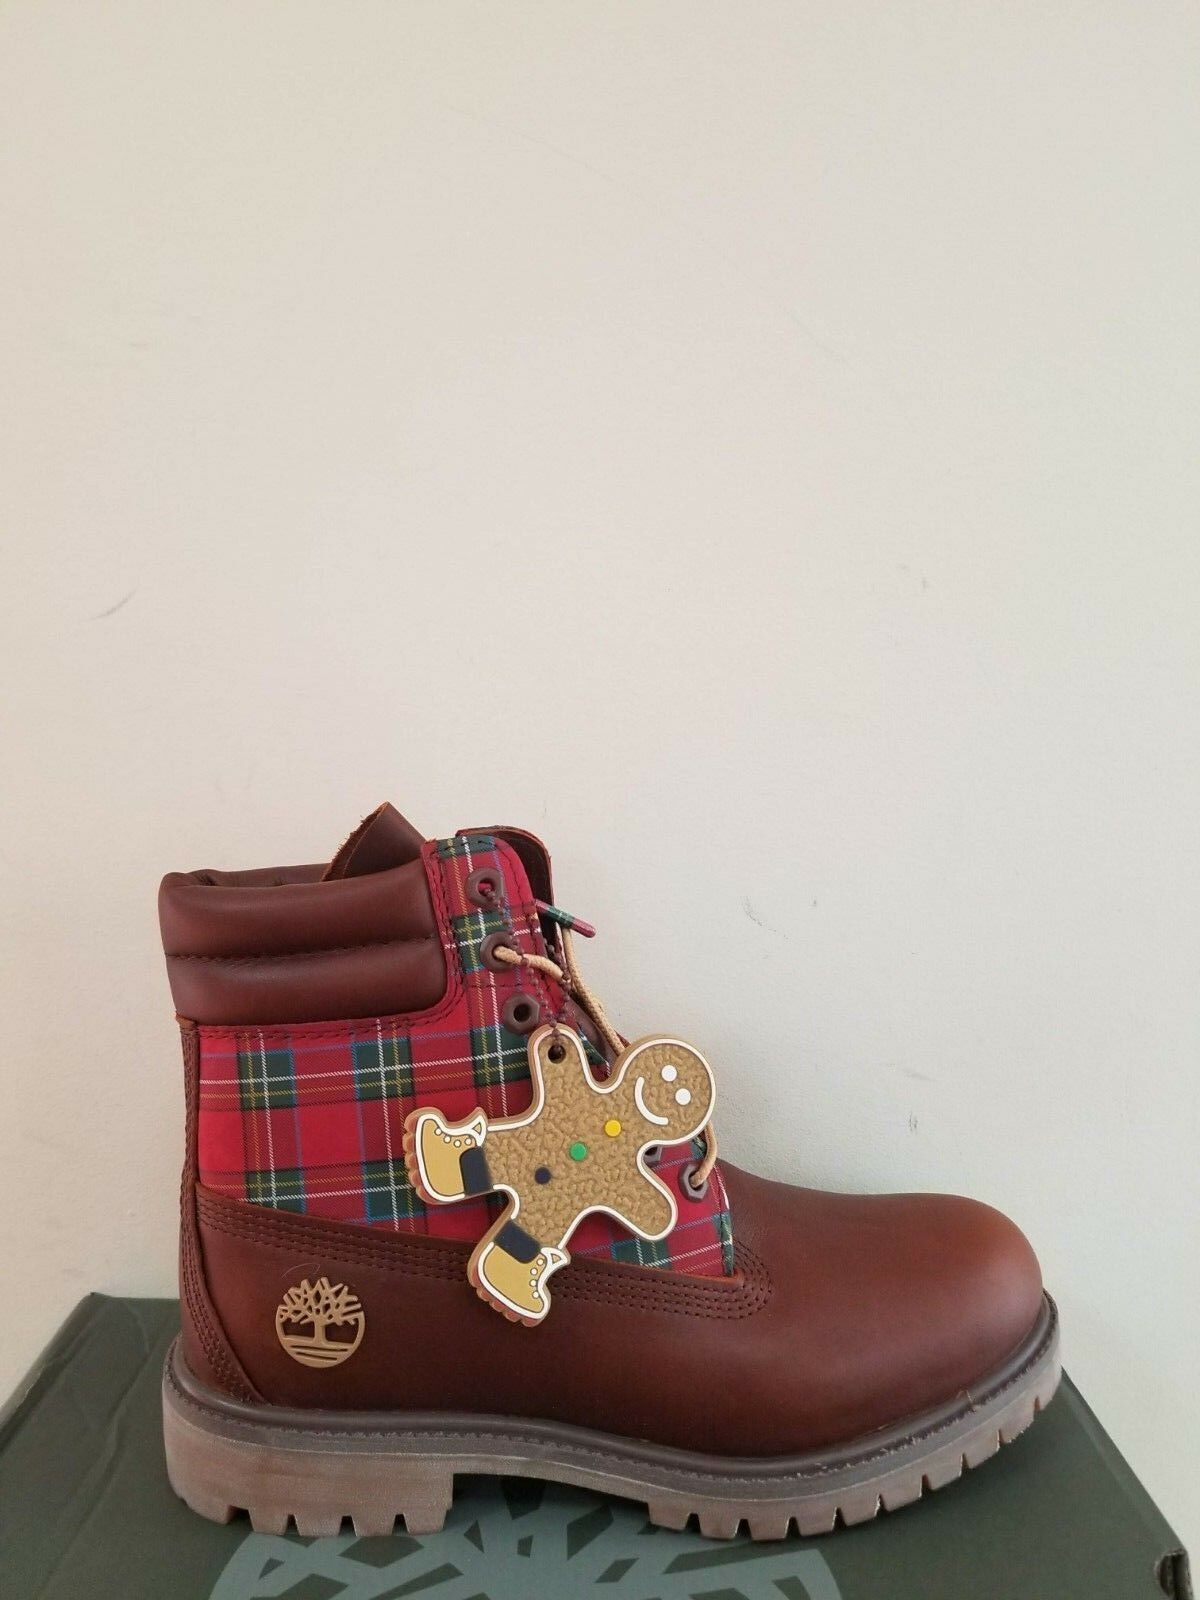 Timberland Women's  6-Inch Premium Waterproof Boots 2018 Holiday Edition NIB